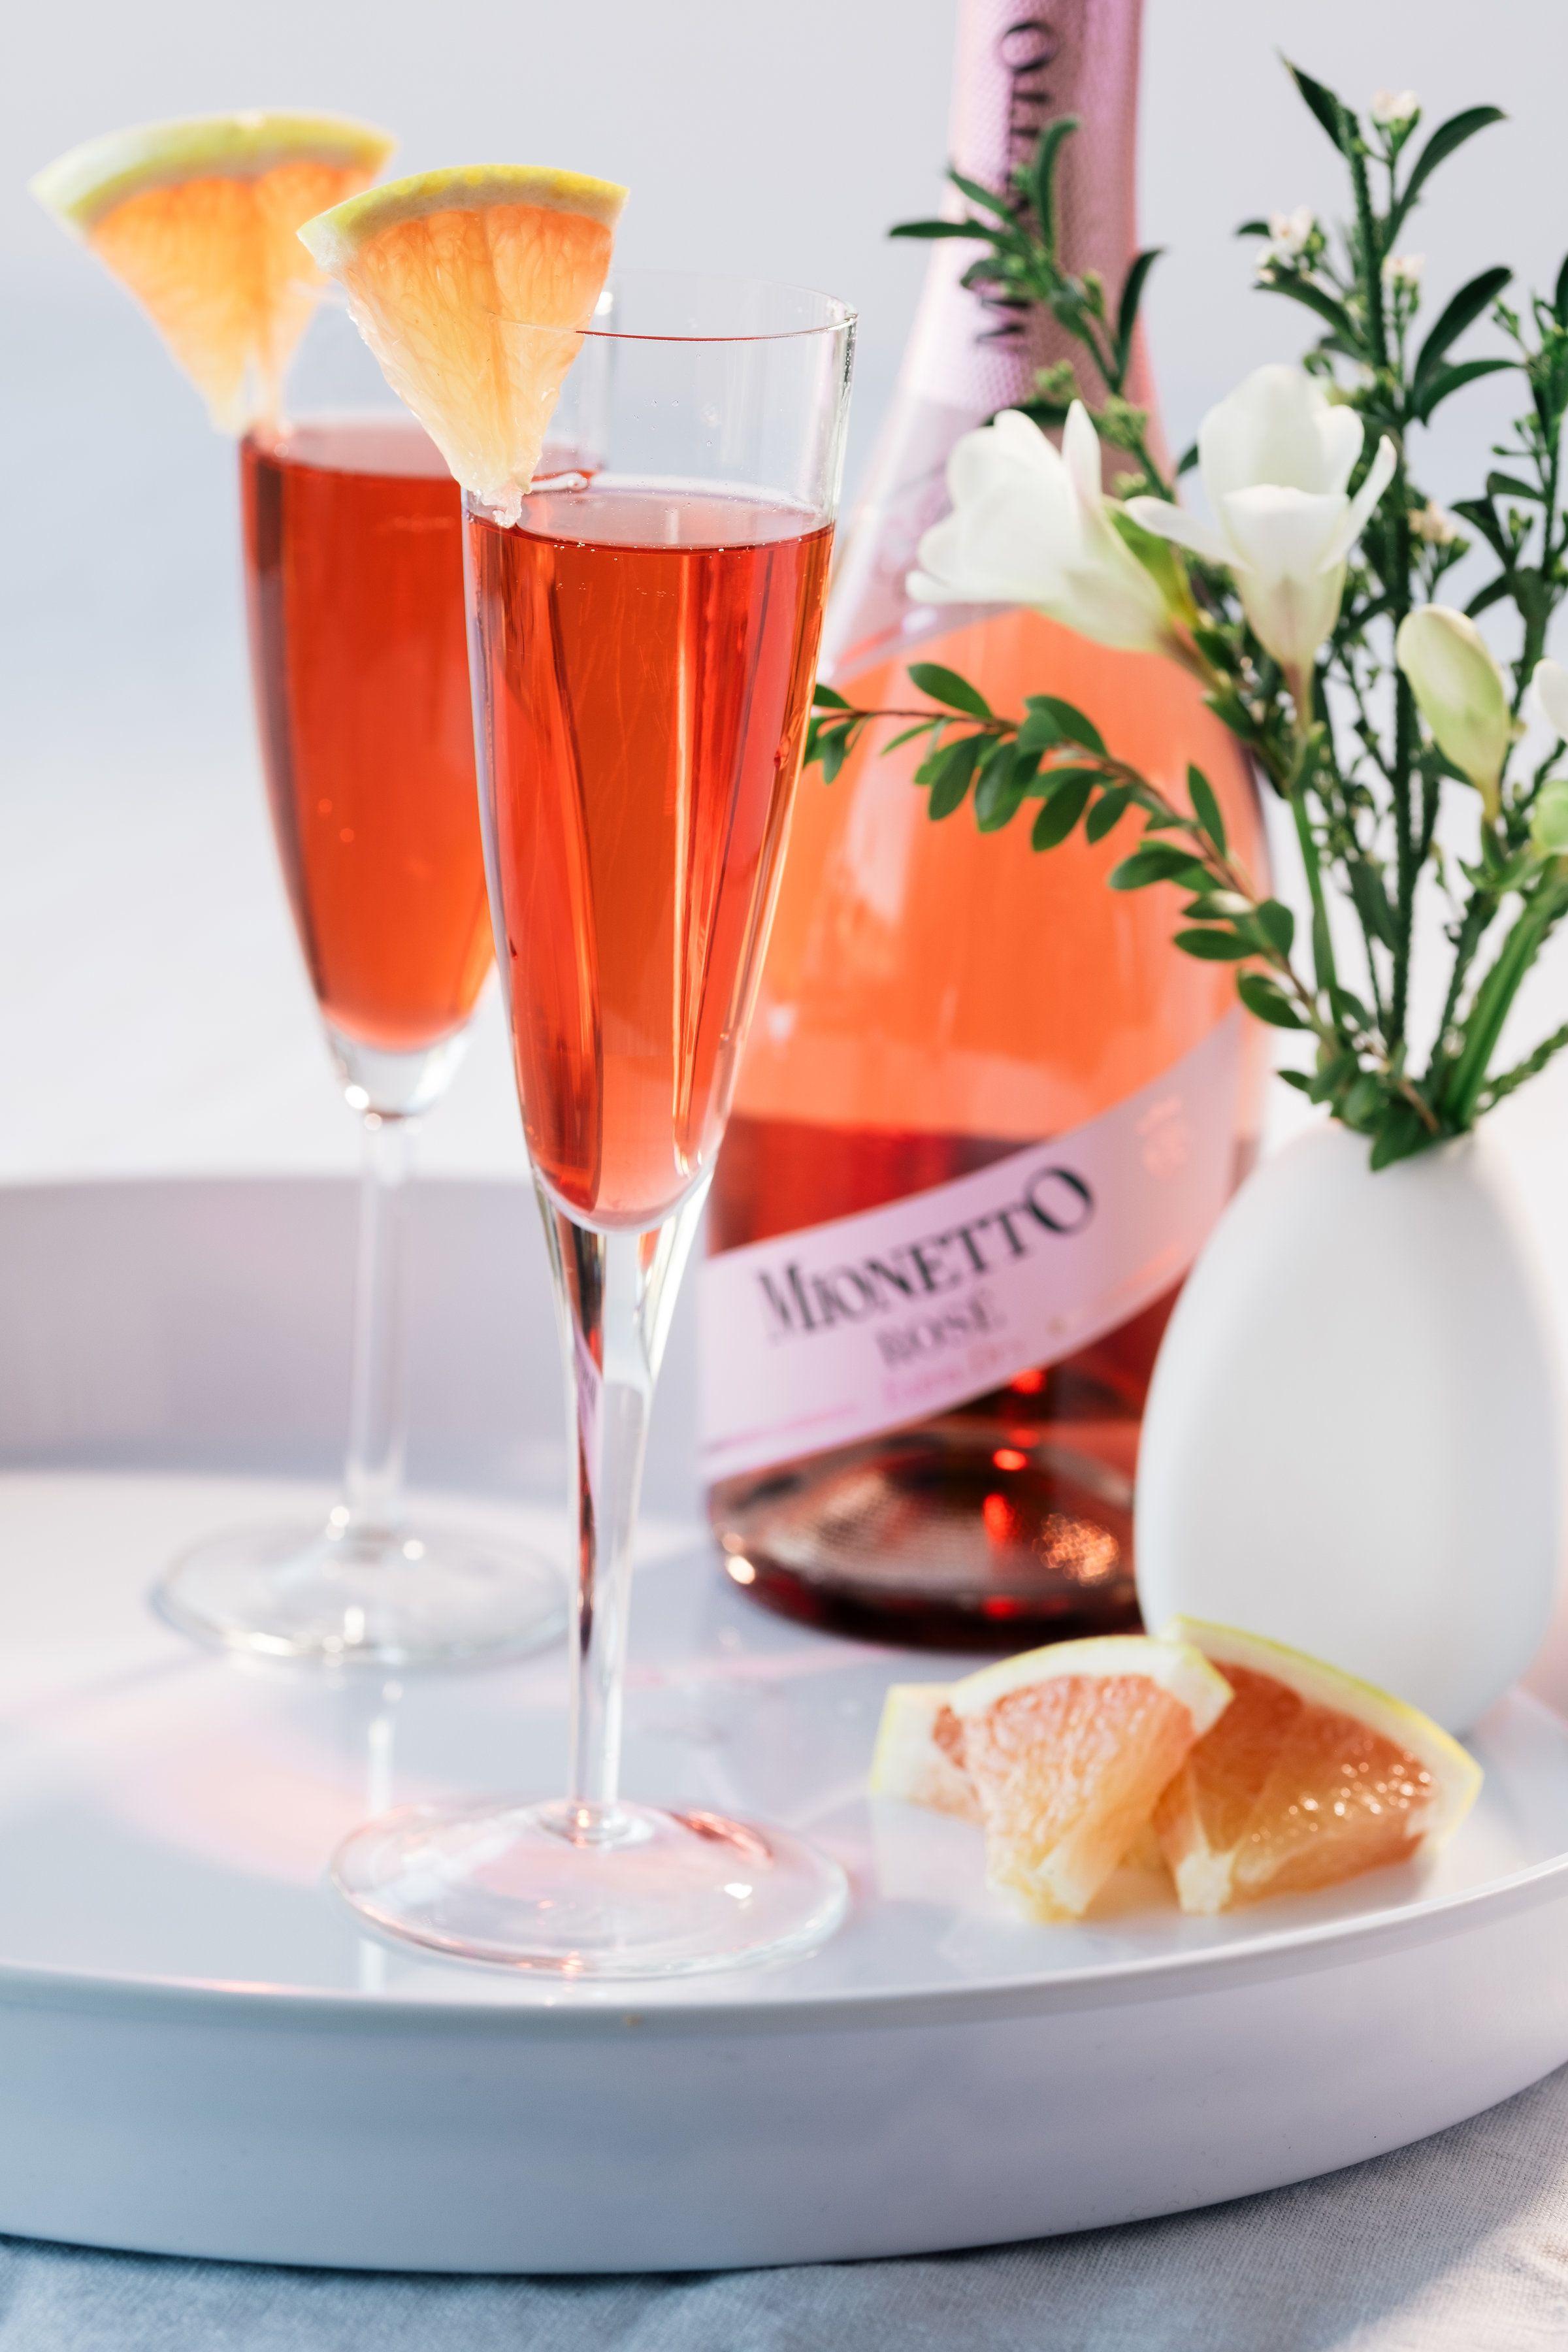 Mionetto Rose Amaro Spritz Spritz Recipe Spritz Champagne Flute